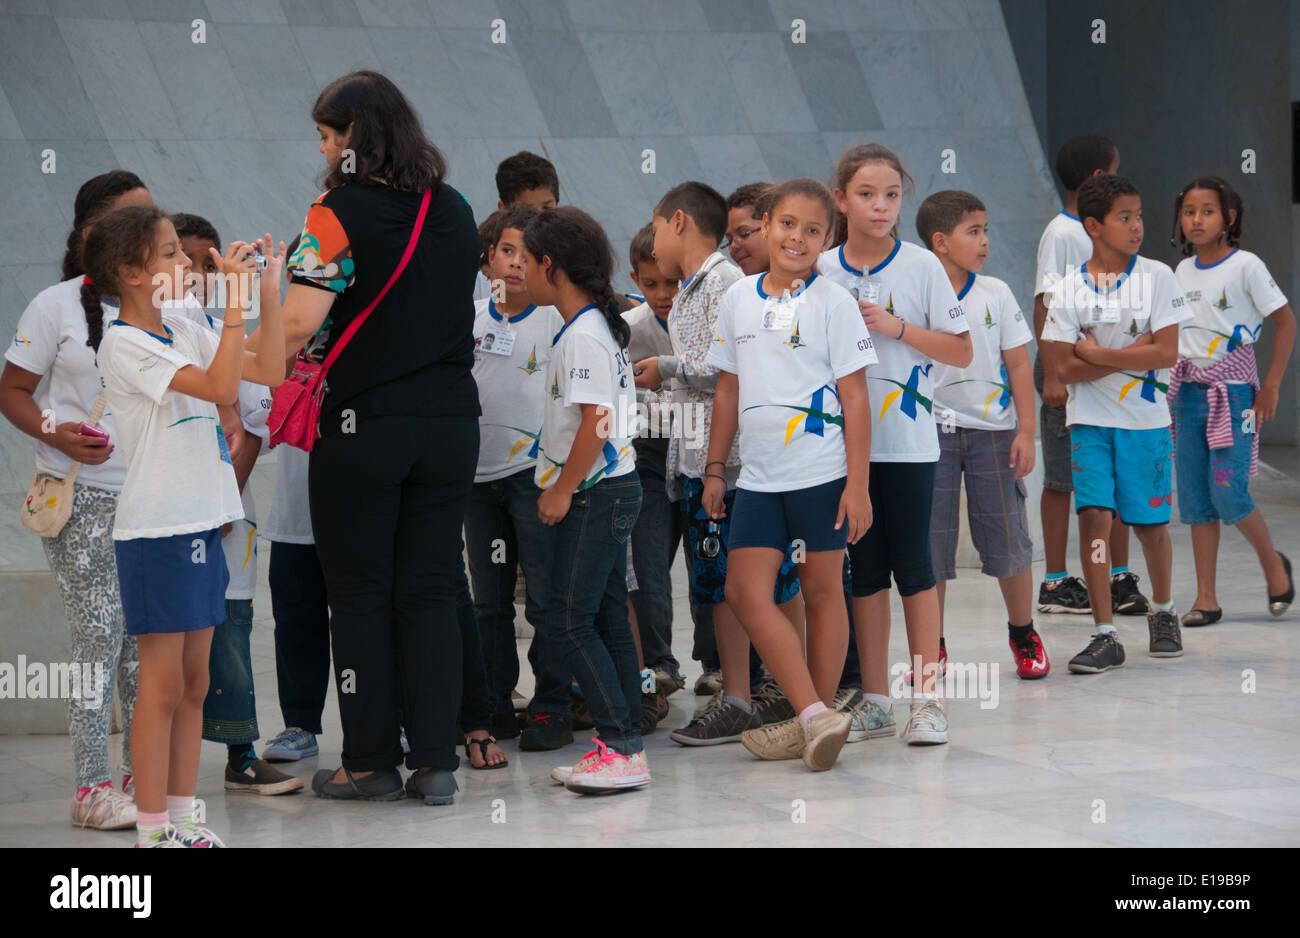 Outing of schoolchildren Brazil Brasilia - Stock Image